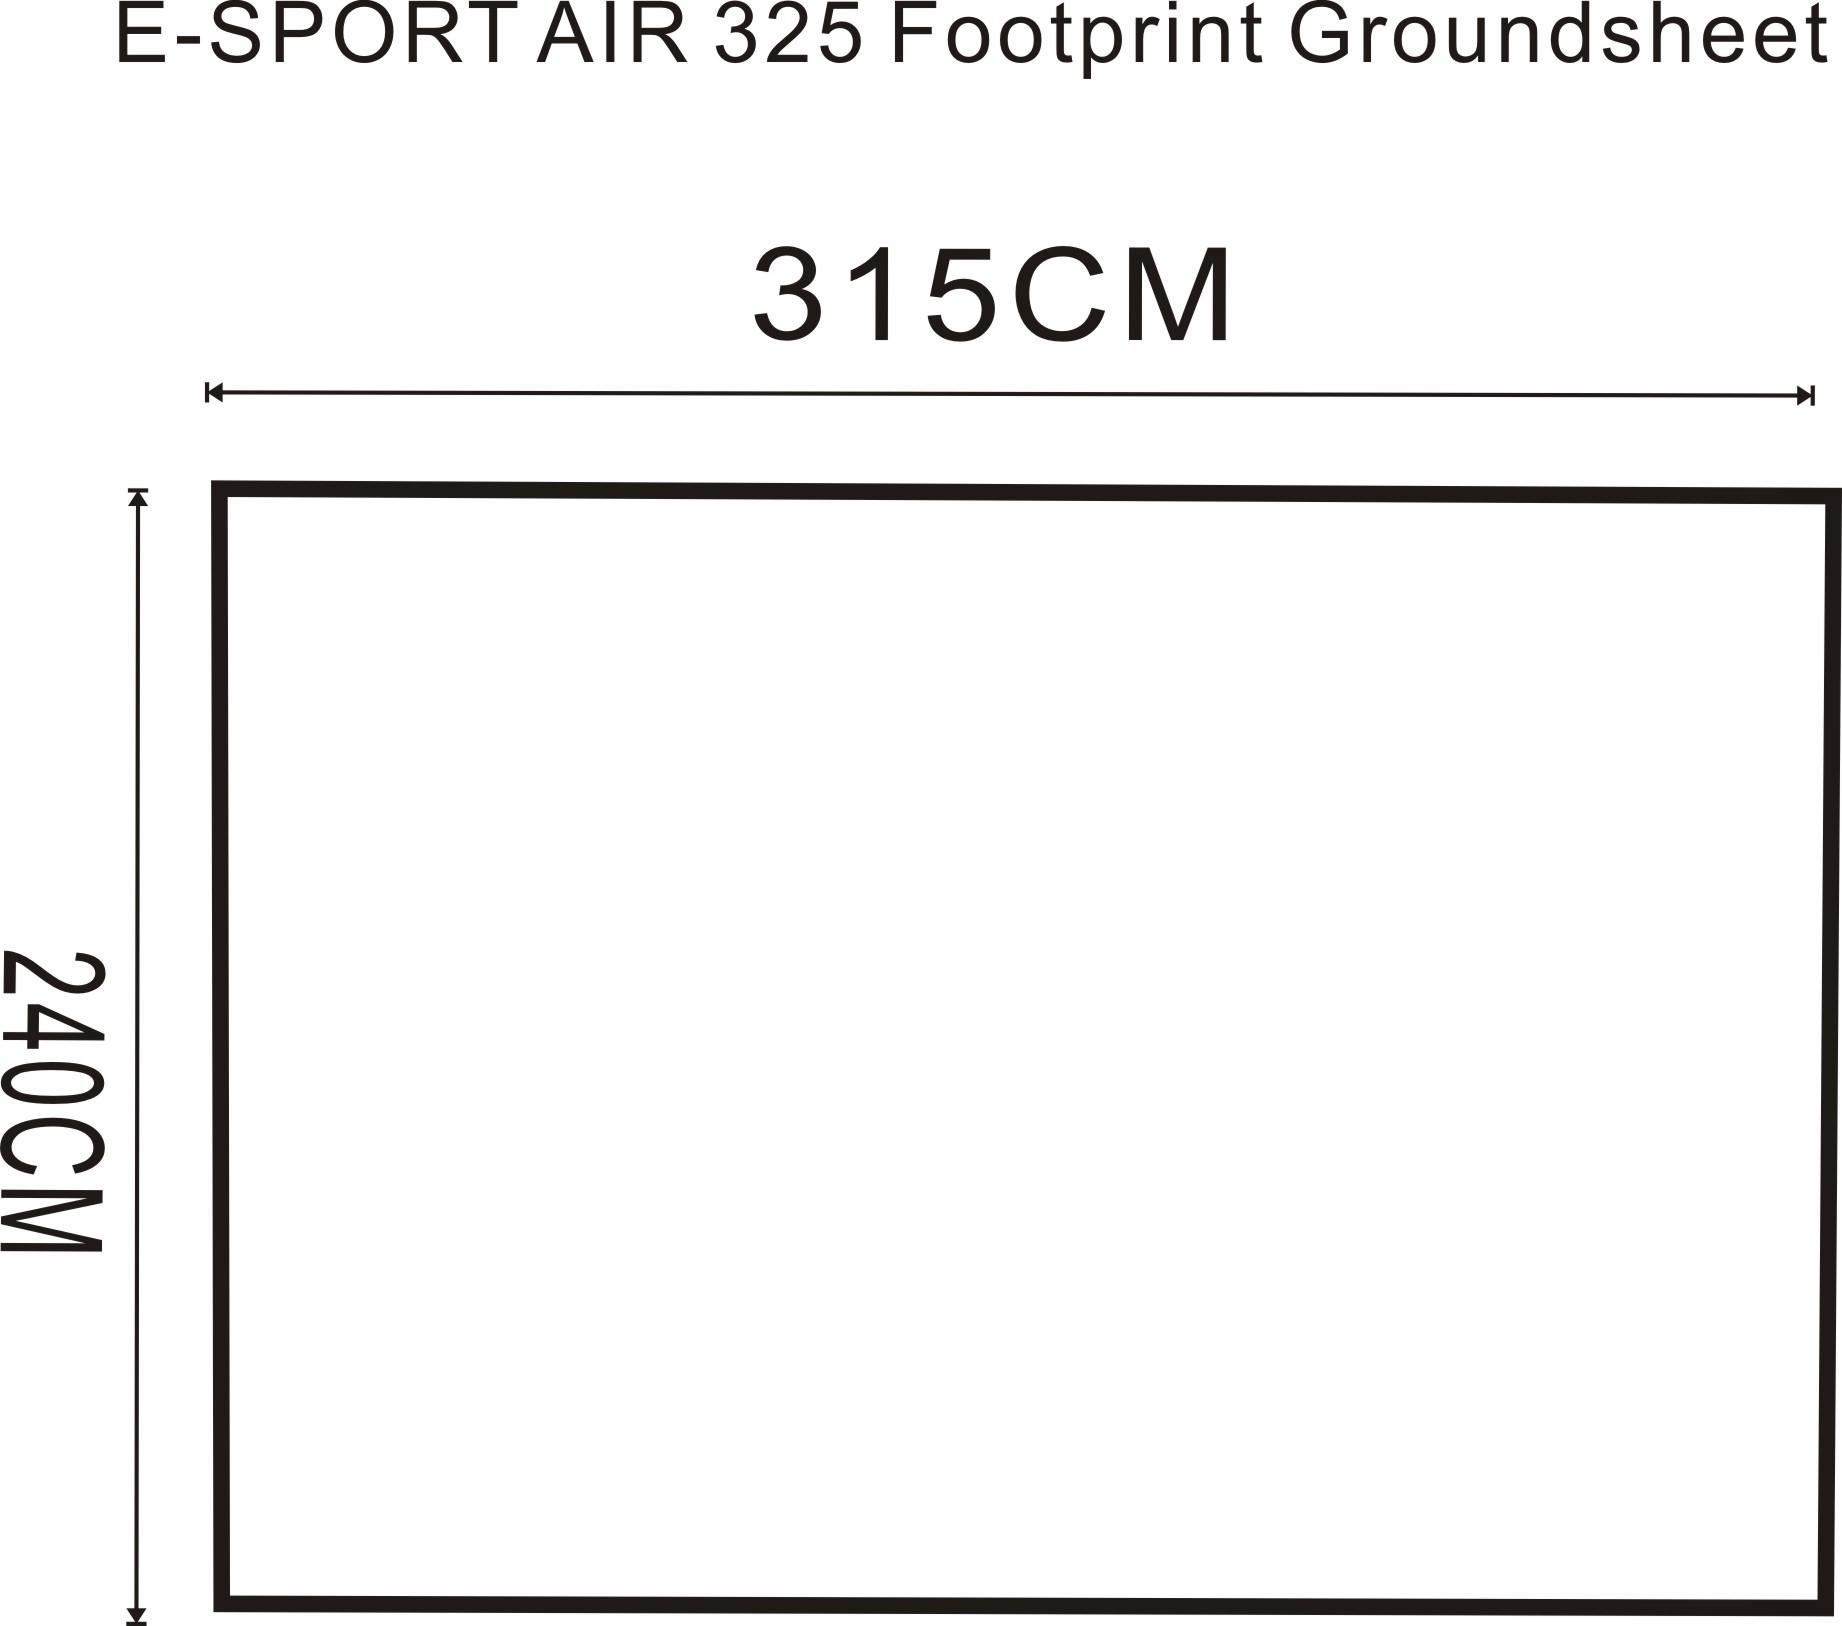 E Sport Air 325 Footprint